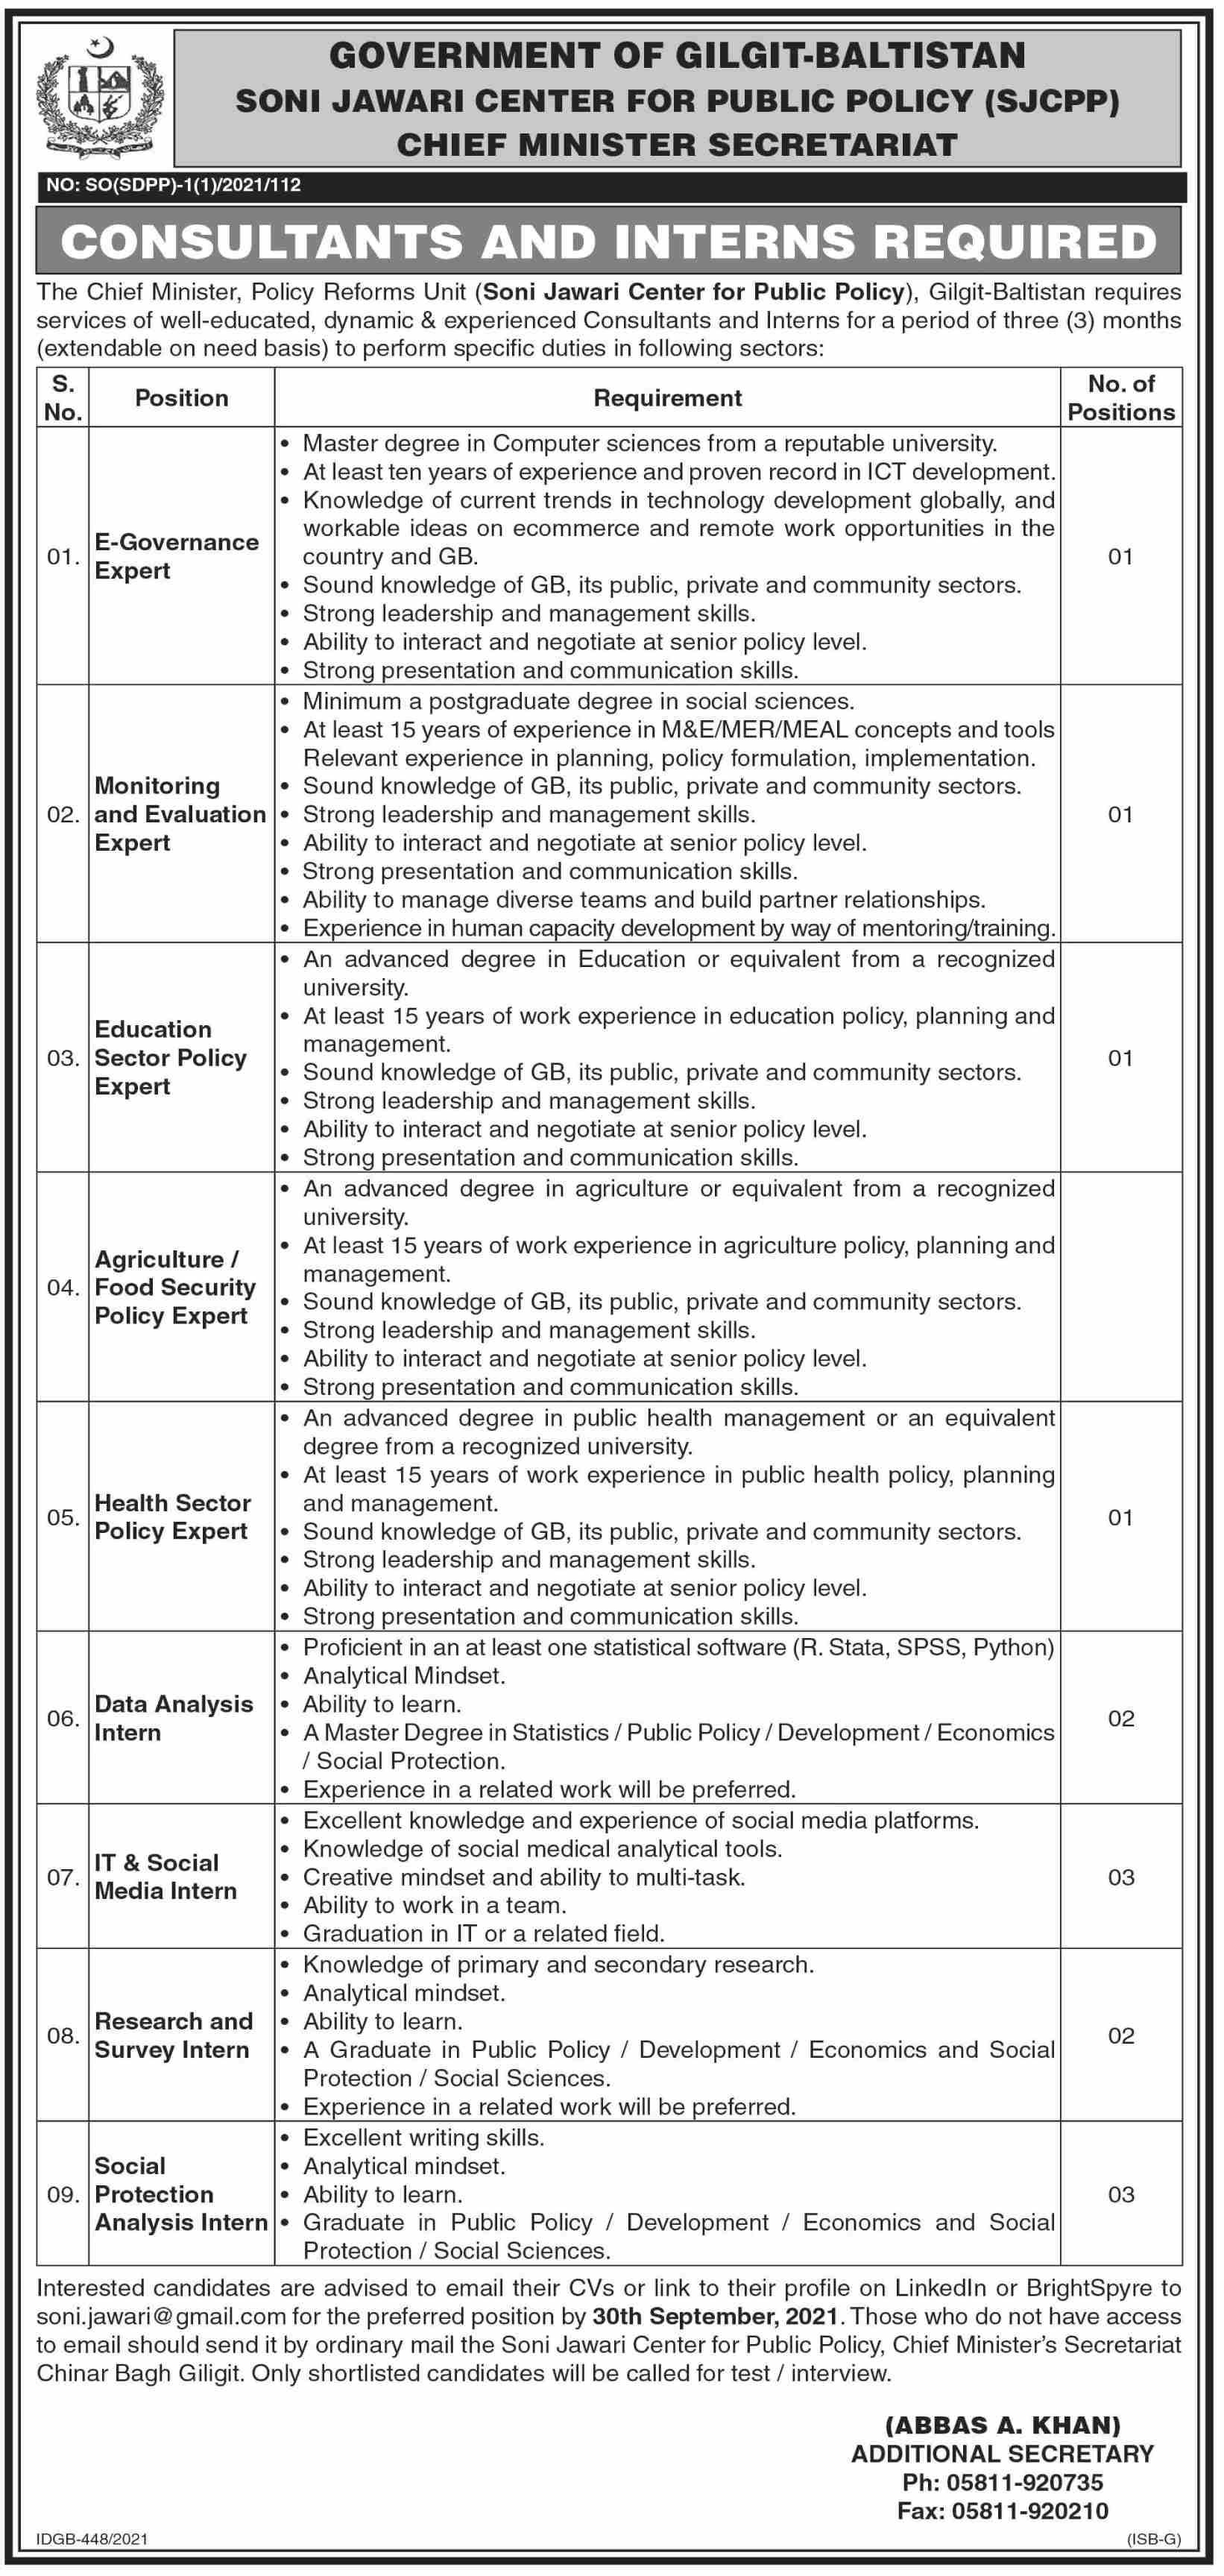 Soni Jawari Center For Public Policy Gilgit Jobs For E Governance Expert, Monitoring & Evaluation Expert, Education Sector Policy Expert advertisemet in newspaper on September 16,2021